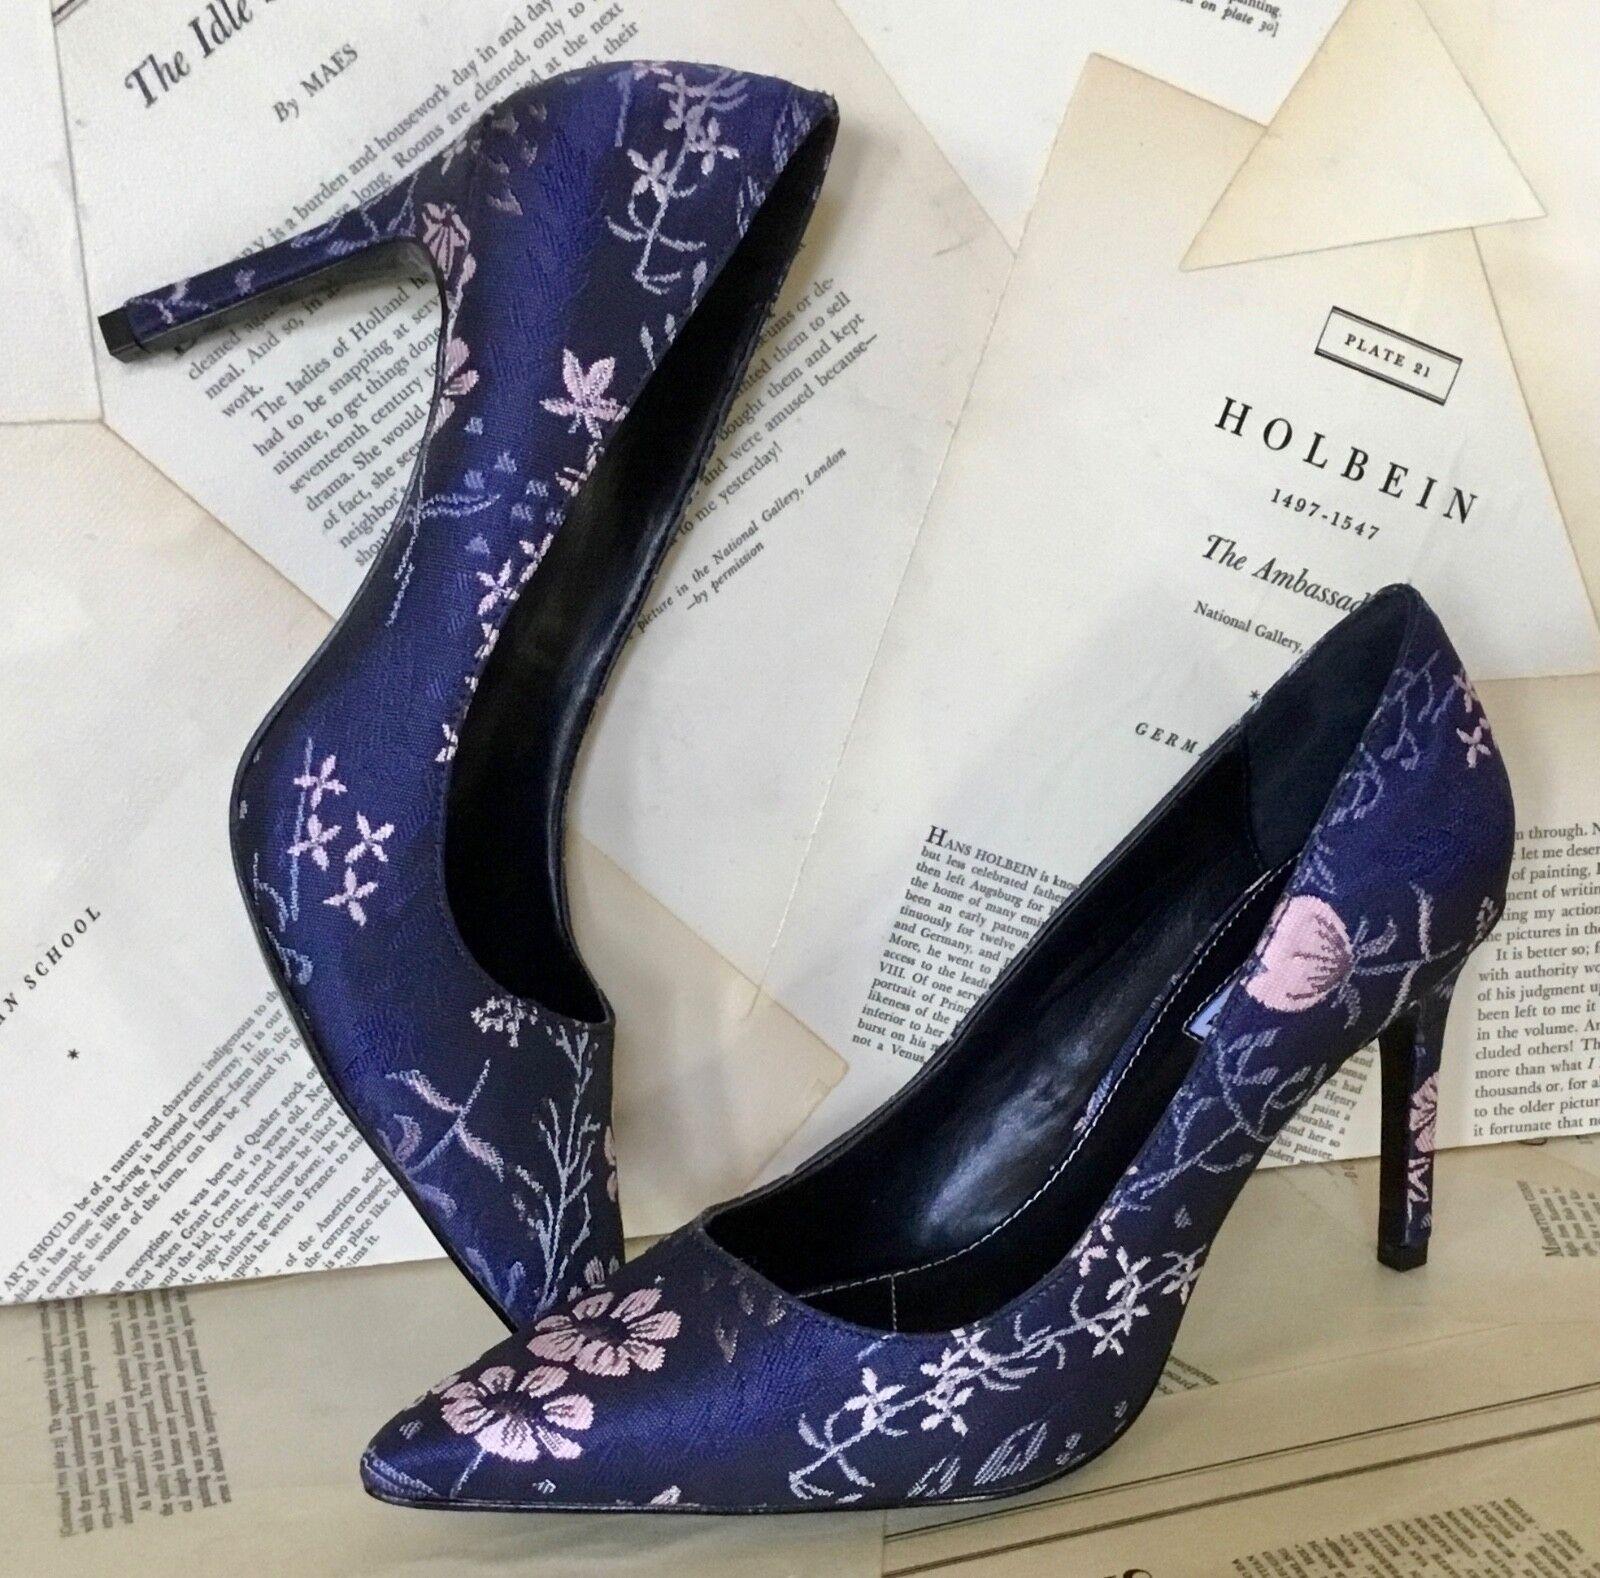 NIB Charles Charles Charles David Blau Rosa Satin Floral Brocade Stiletto Pump Heel 9  228 018459